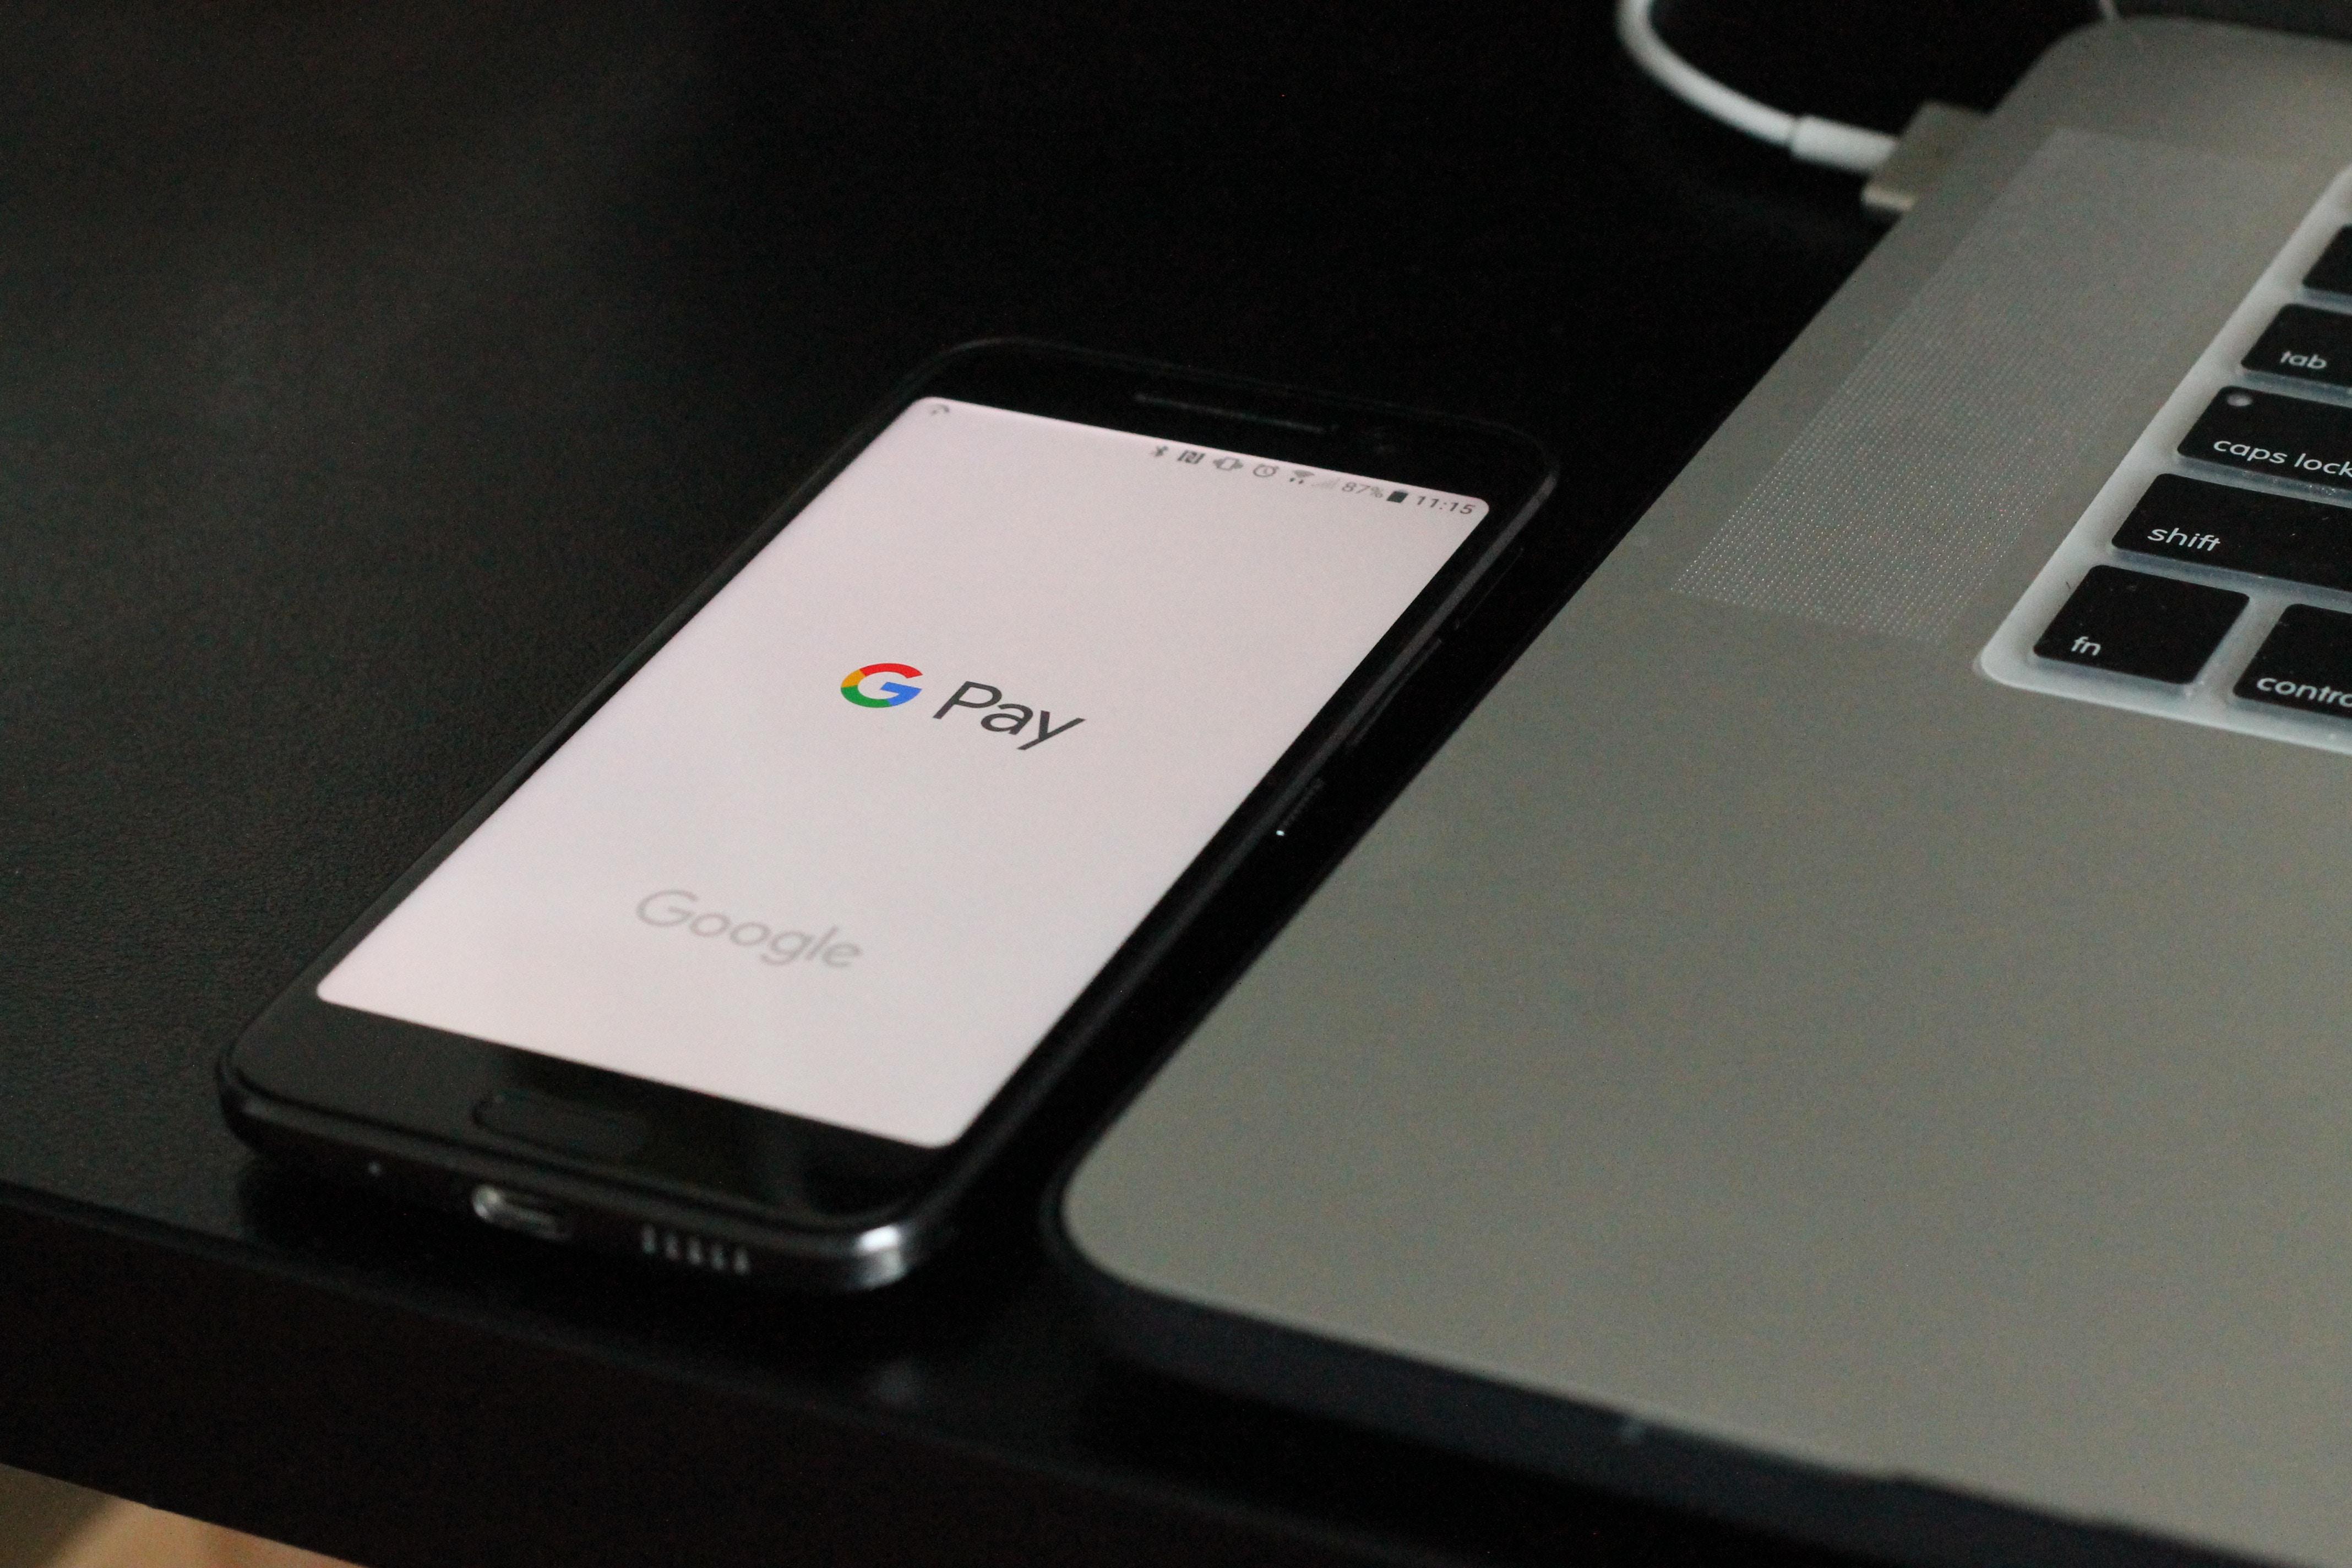 Google Payの使う際に抑えておくべきメリットとデメリット